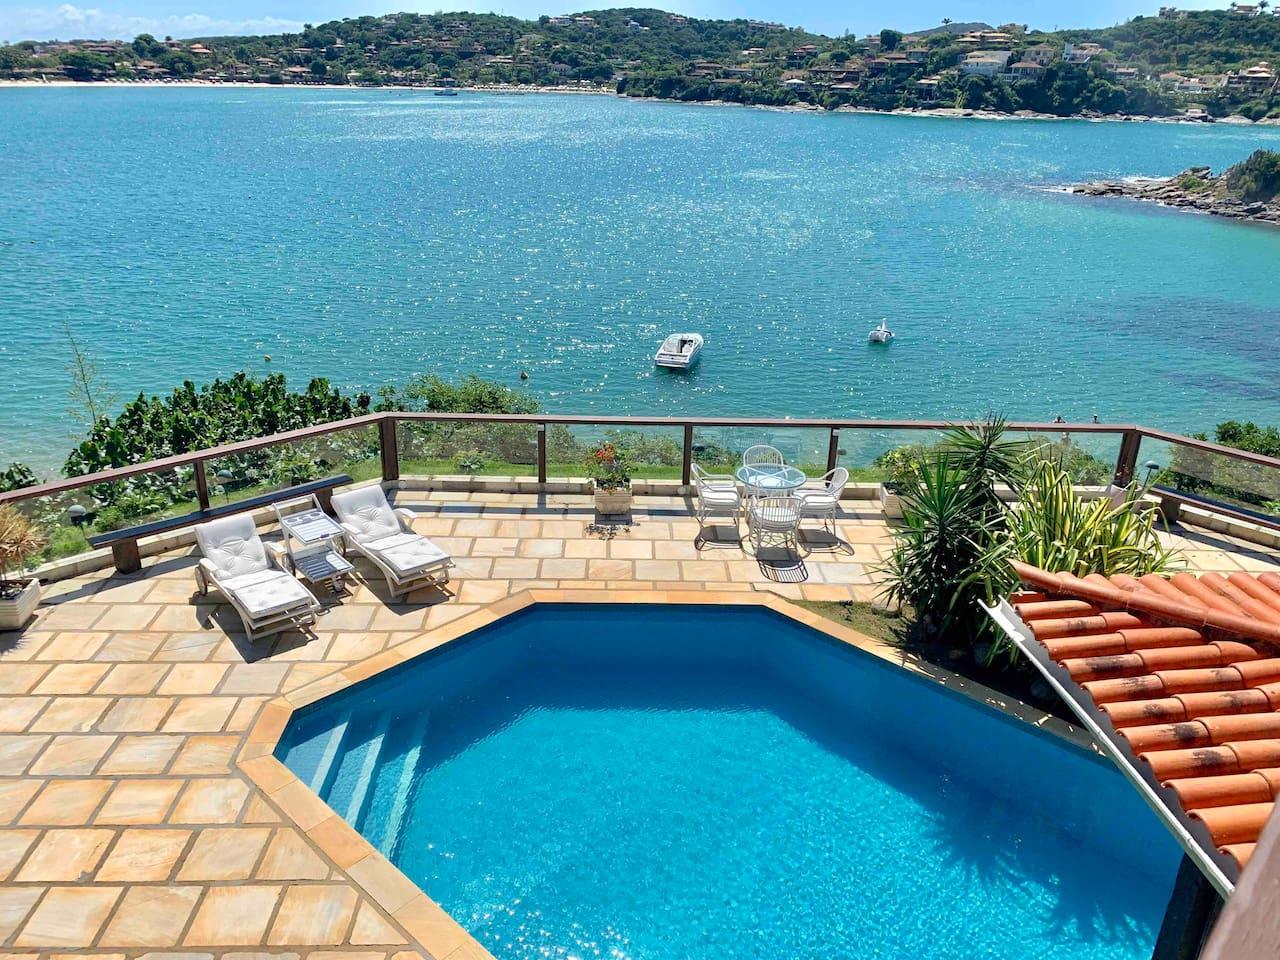 Piscina debruçada sobre linda e calma Praia da Ferradura // Pool overlooking the beautiful and calm Ferradura Beach